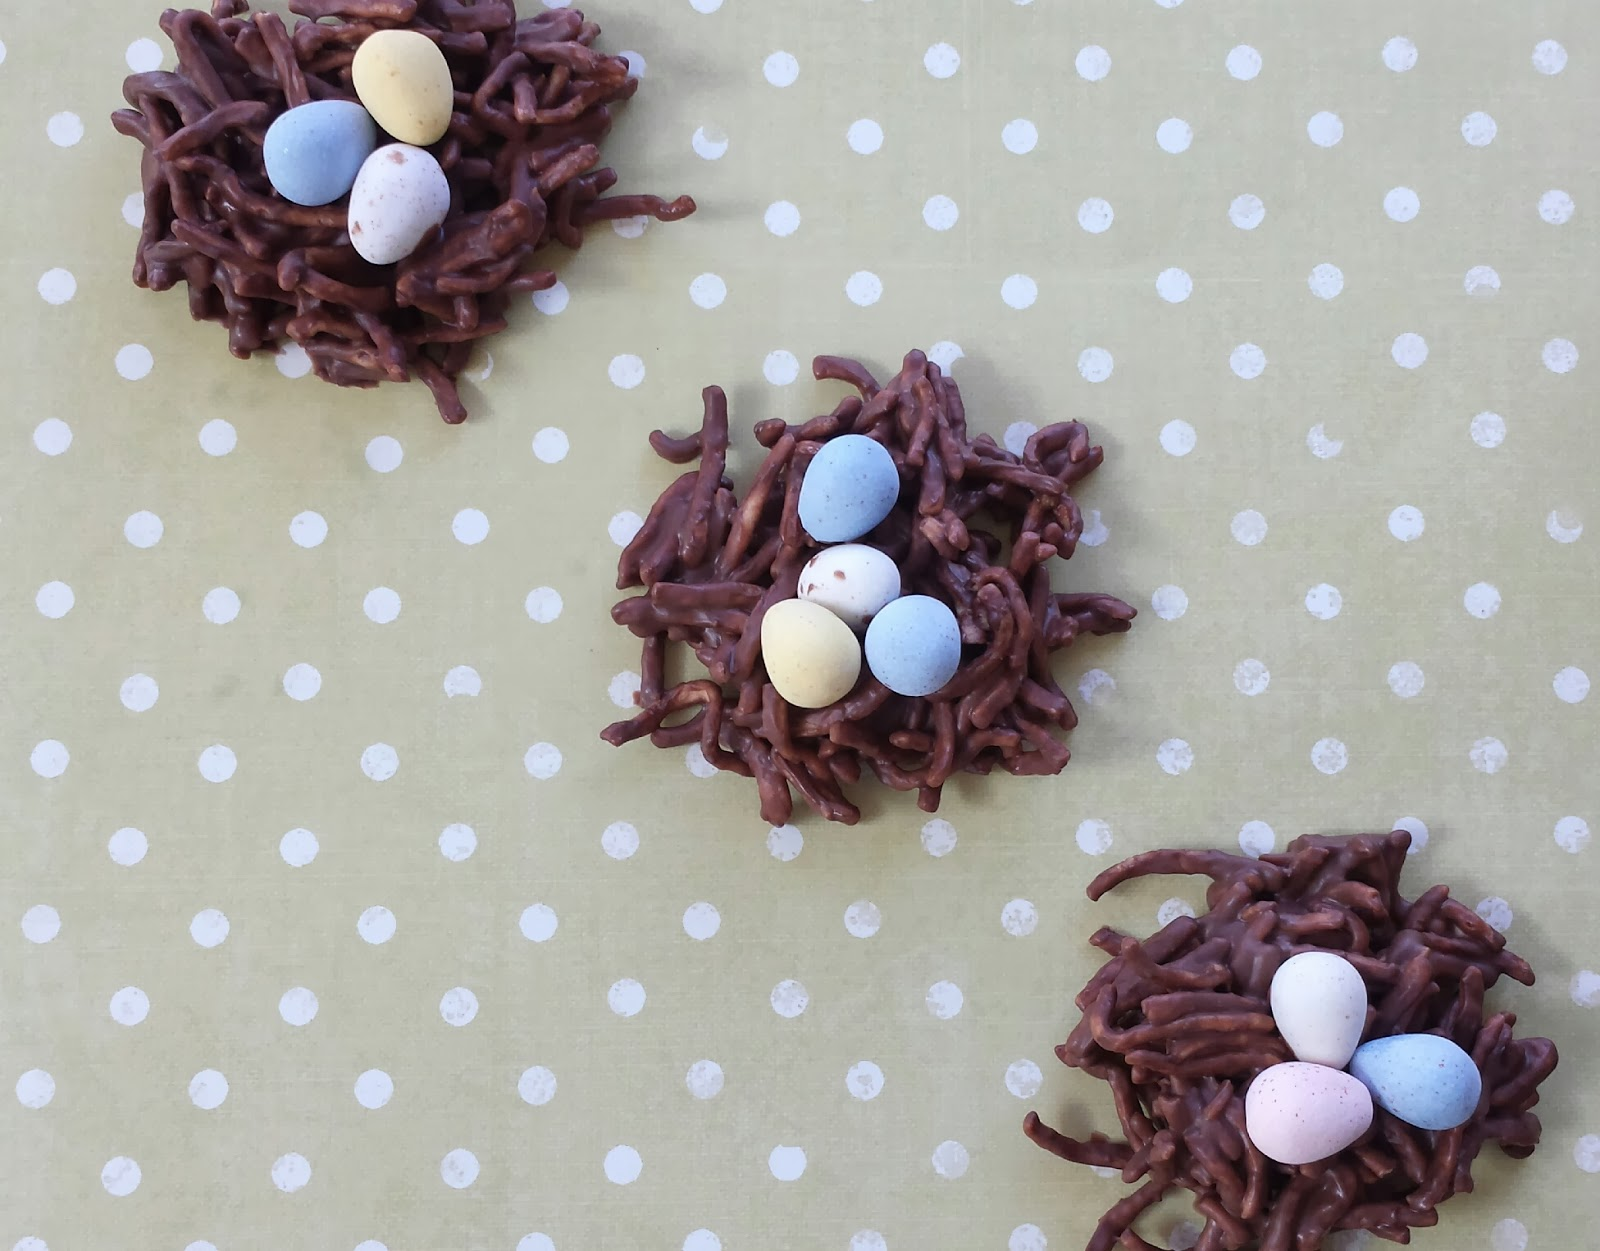 candy bird nests